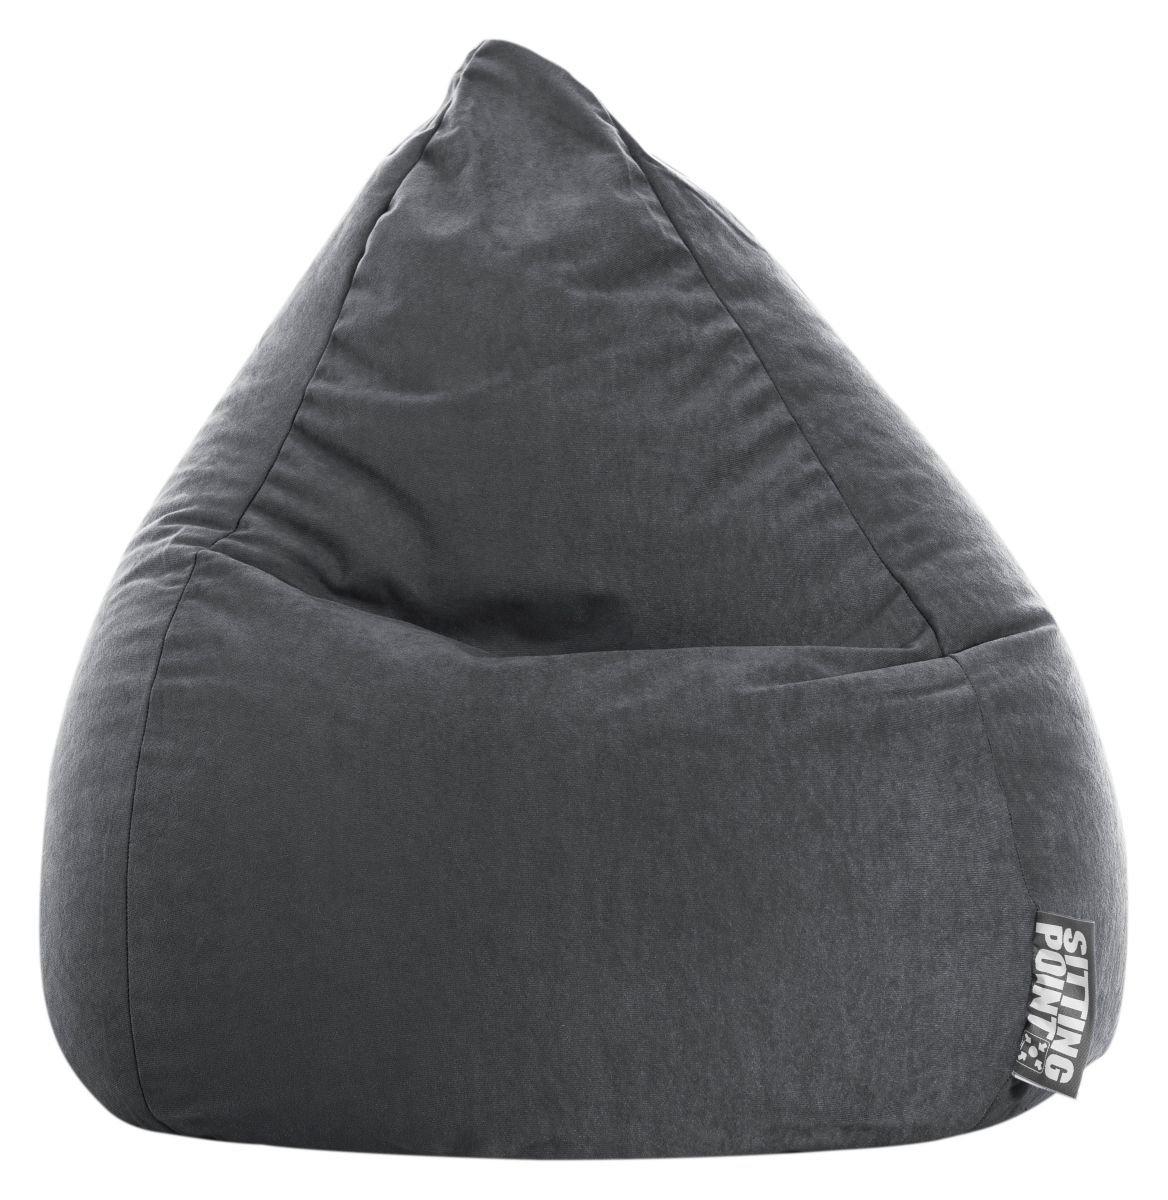 sitting point kinder zitzak beanbag easy l antraciet